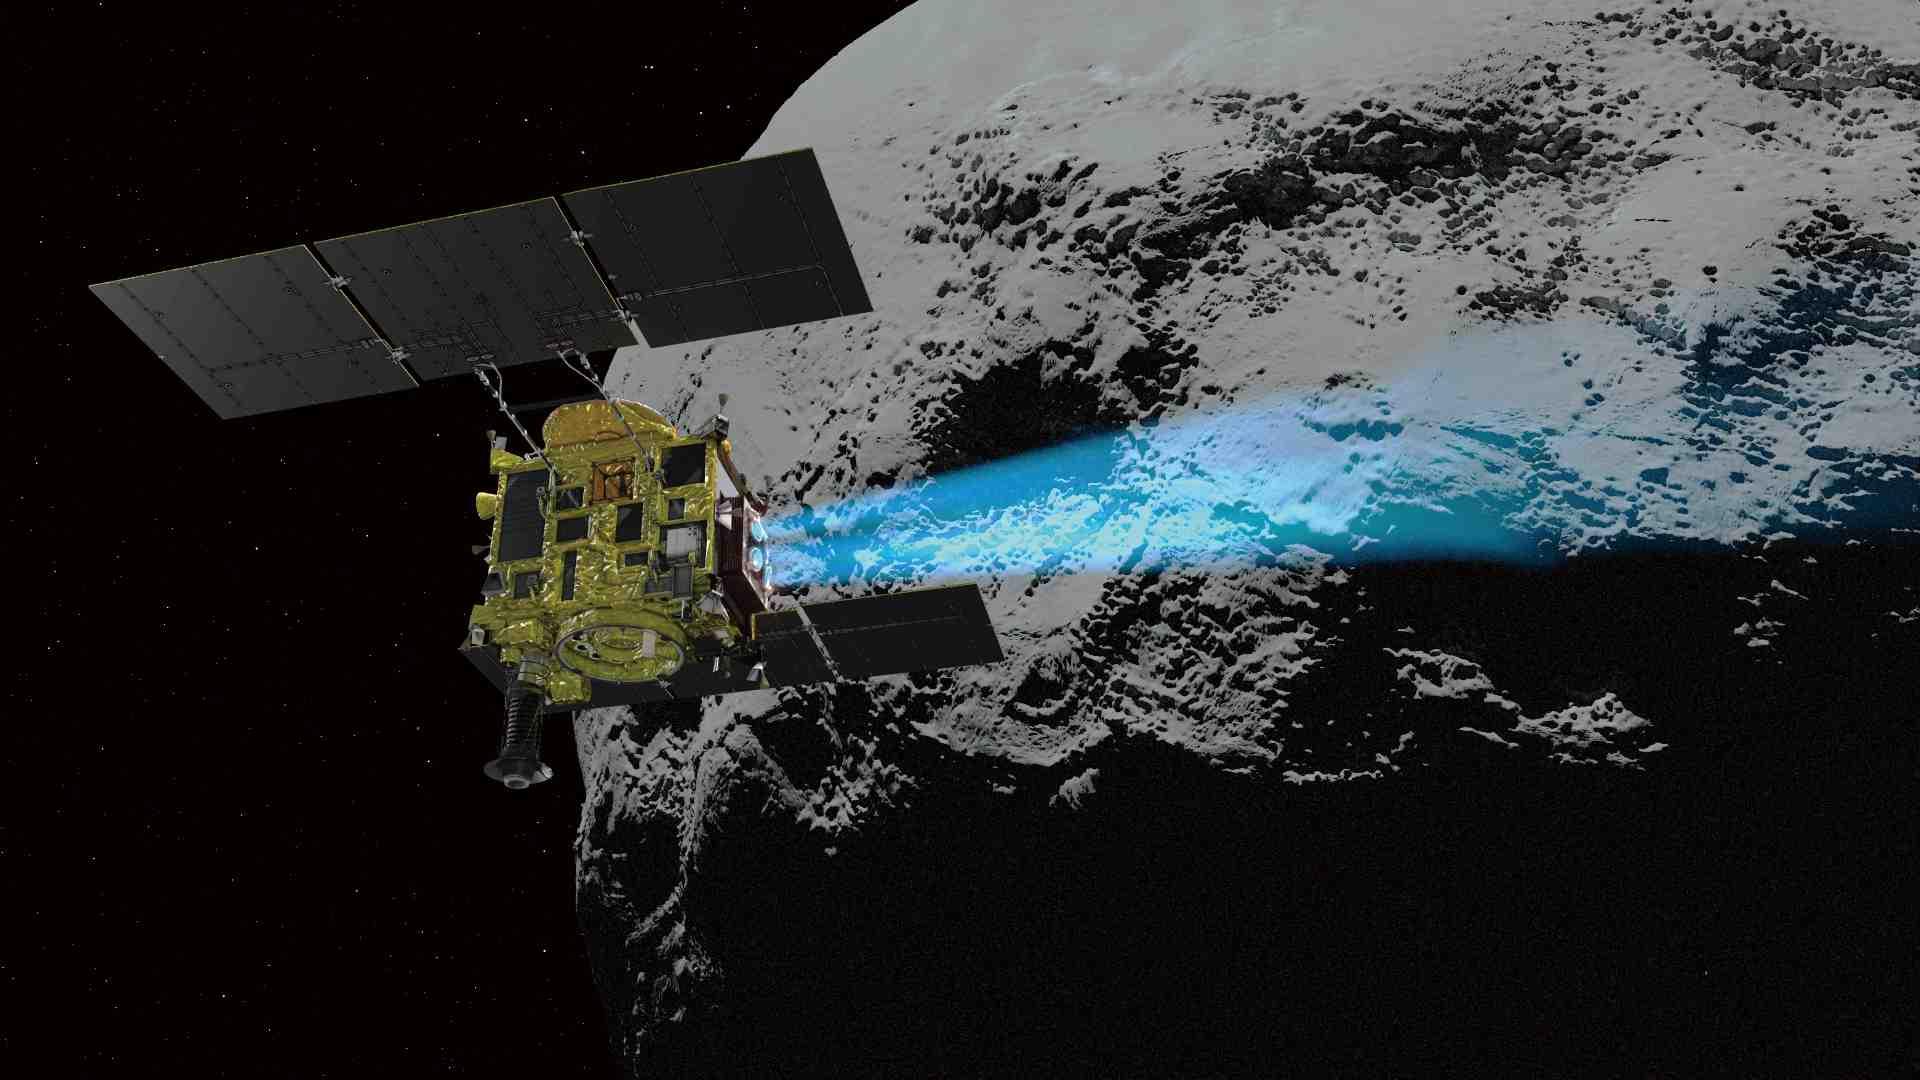 JAXA Space Probe Hayabusa2 003